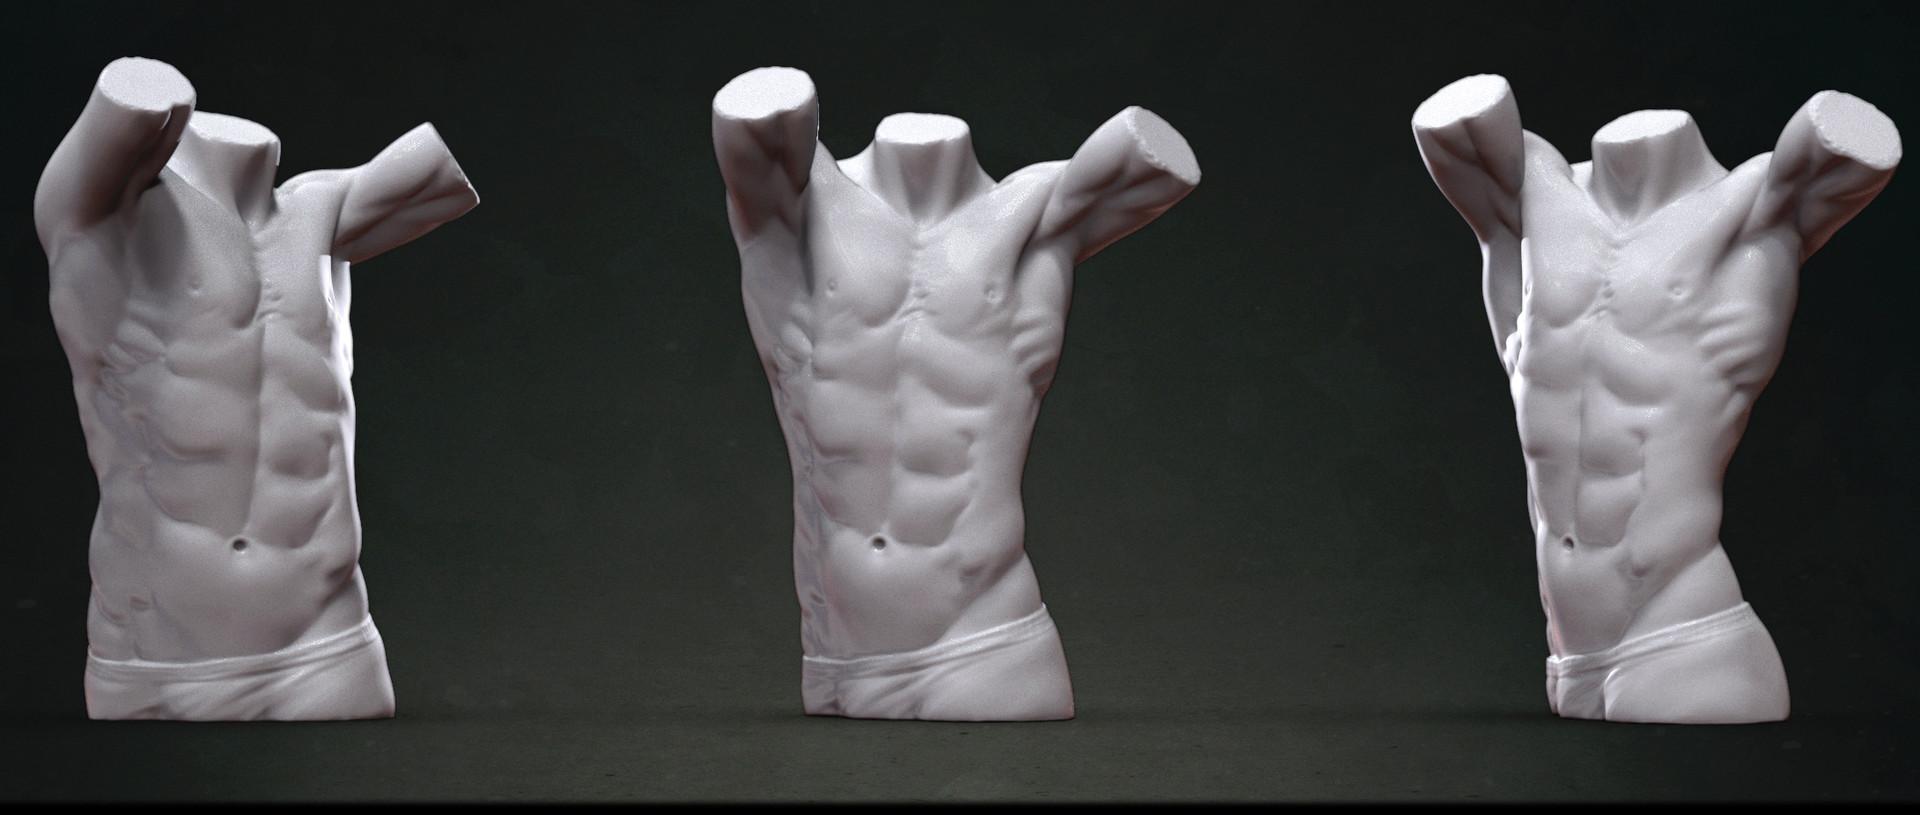 Rahul garg (Doyen) - Male Torso Anatomy Study